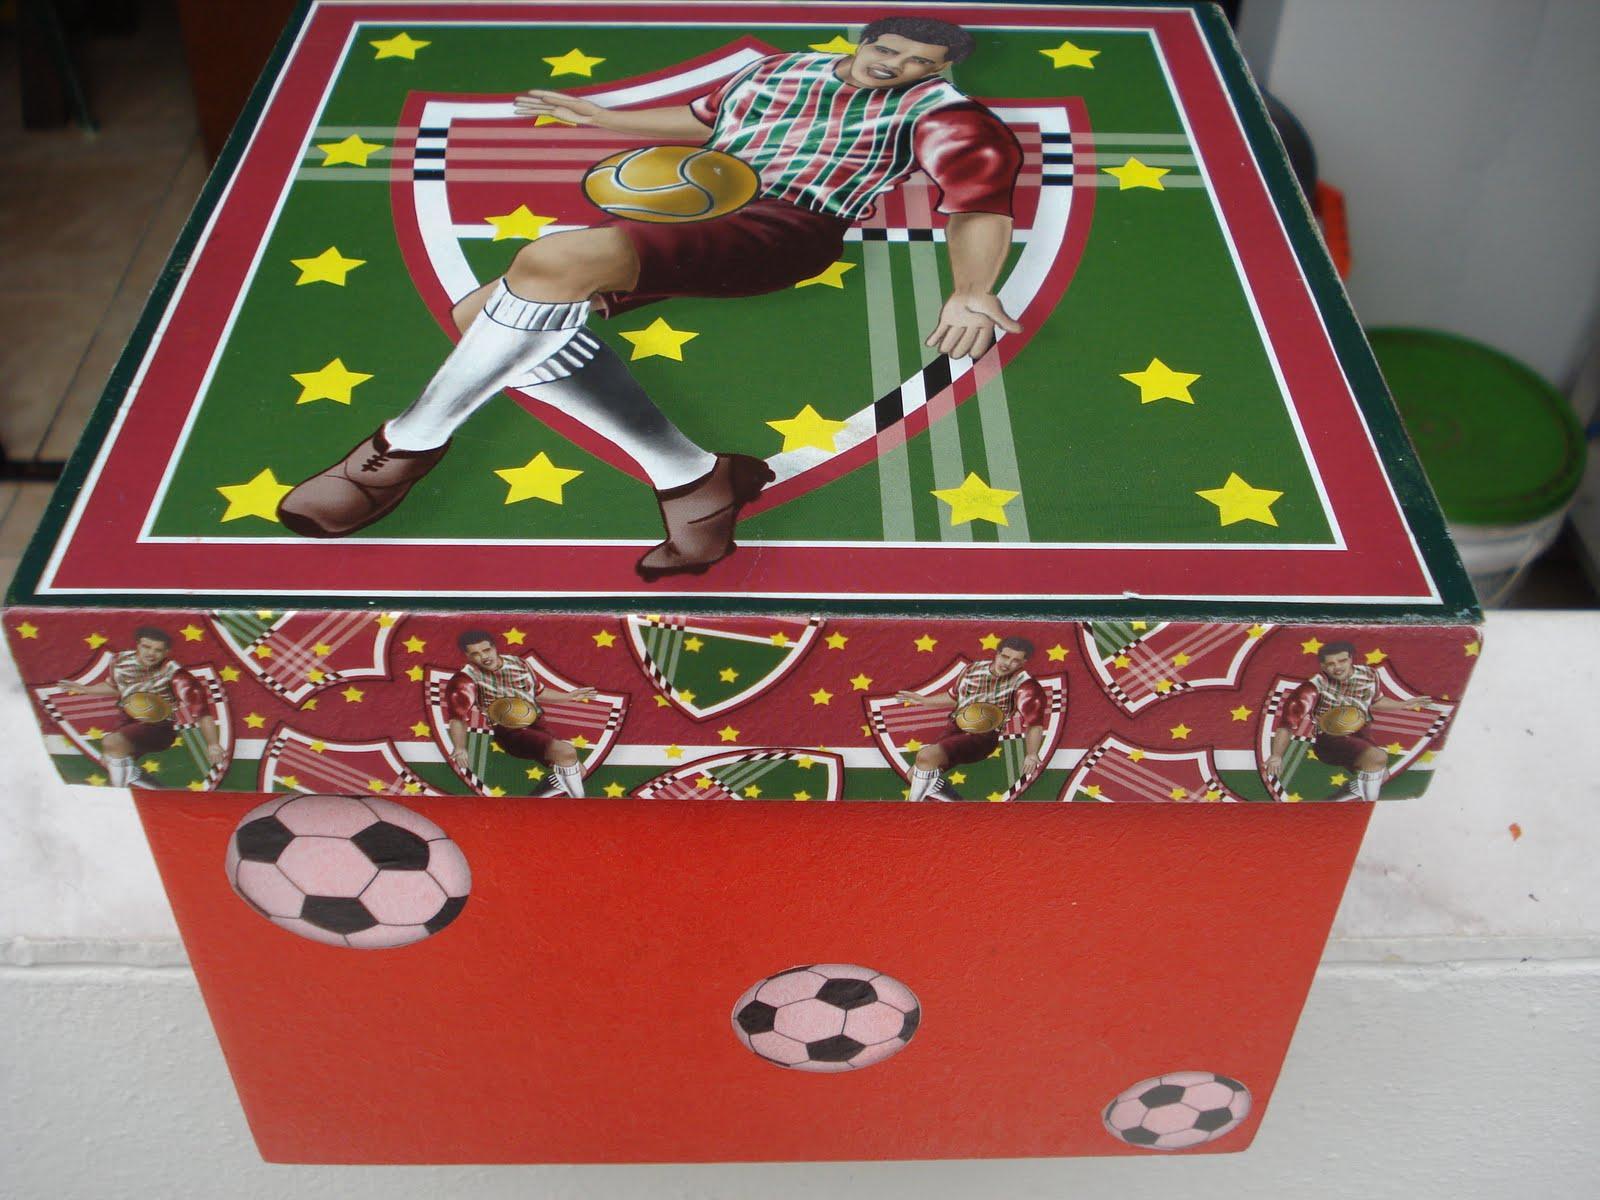 Caixa do Fluminense para guardar brinquedos (Trunfo por exemplo). #ADAA1E 1600x1200